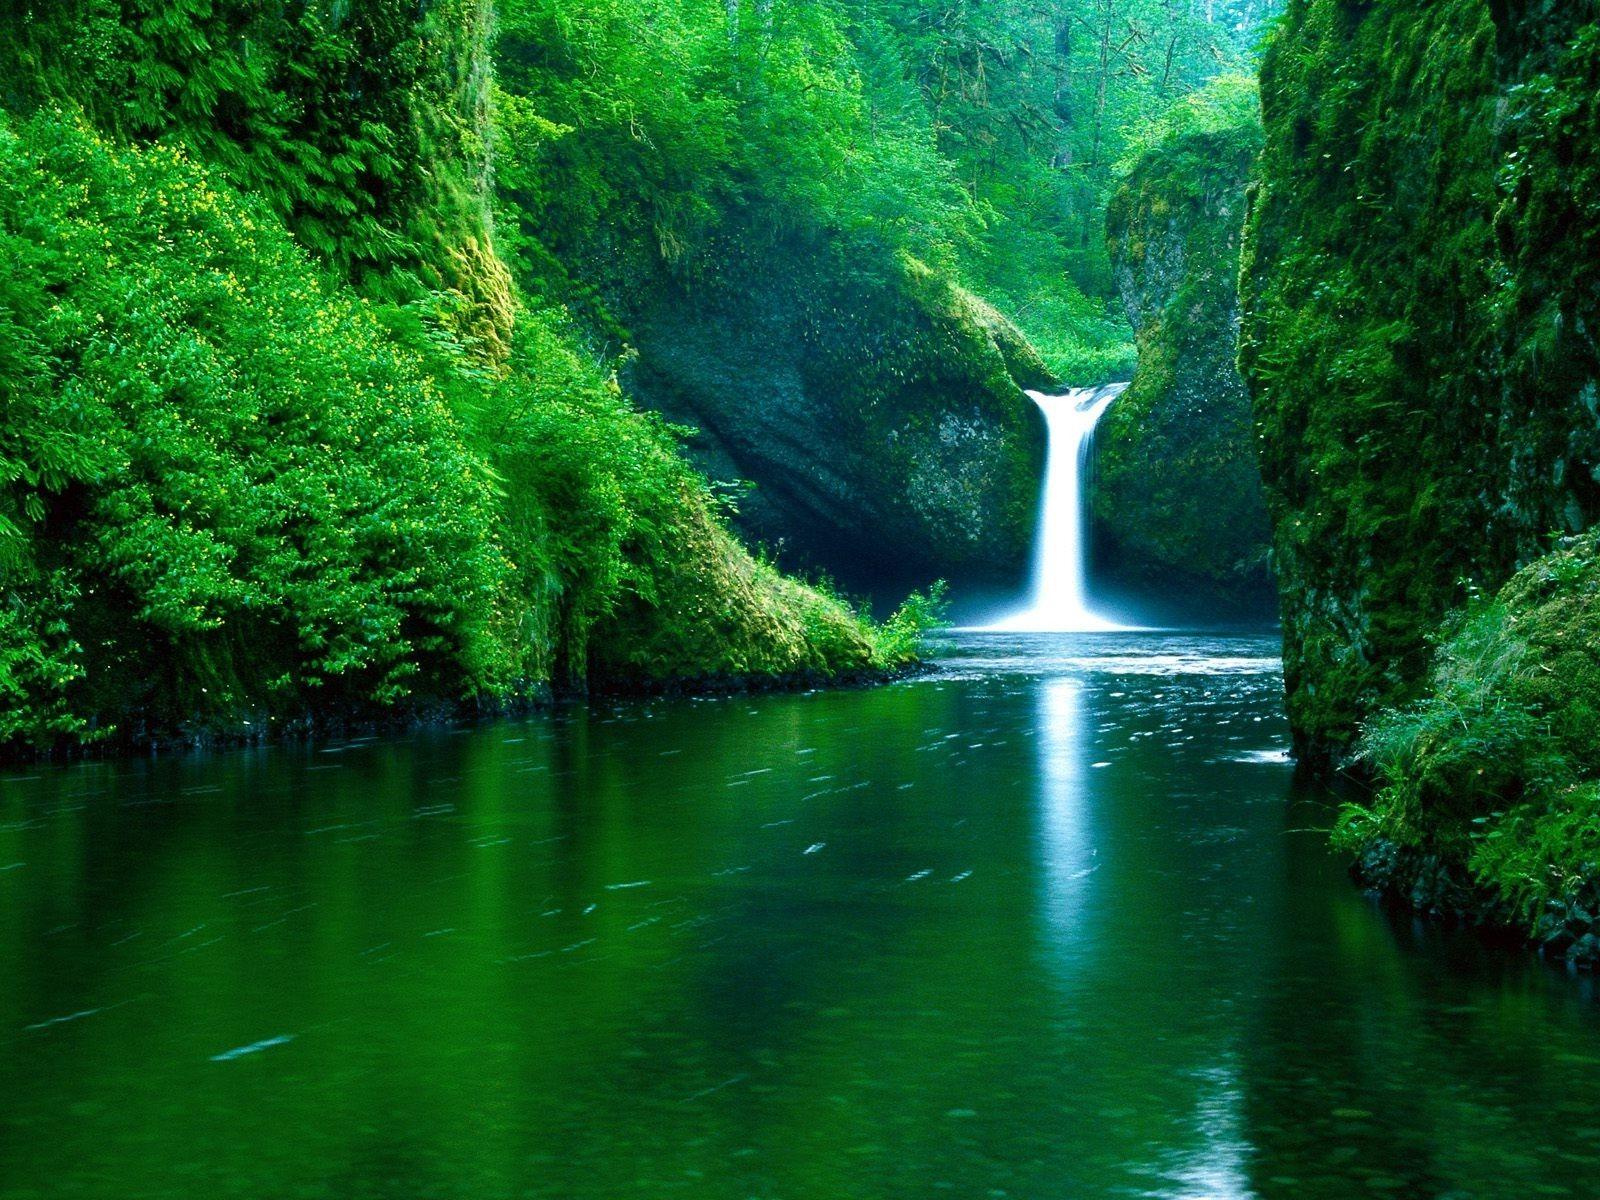 Green trees #1688283 | UNIVERSAL PROFESIONALISM CLEO2525 | Pinterest ...